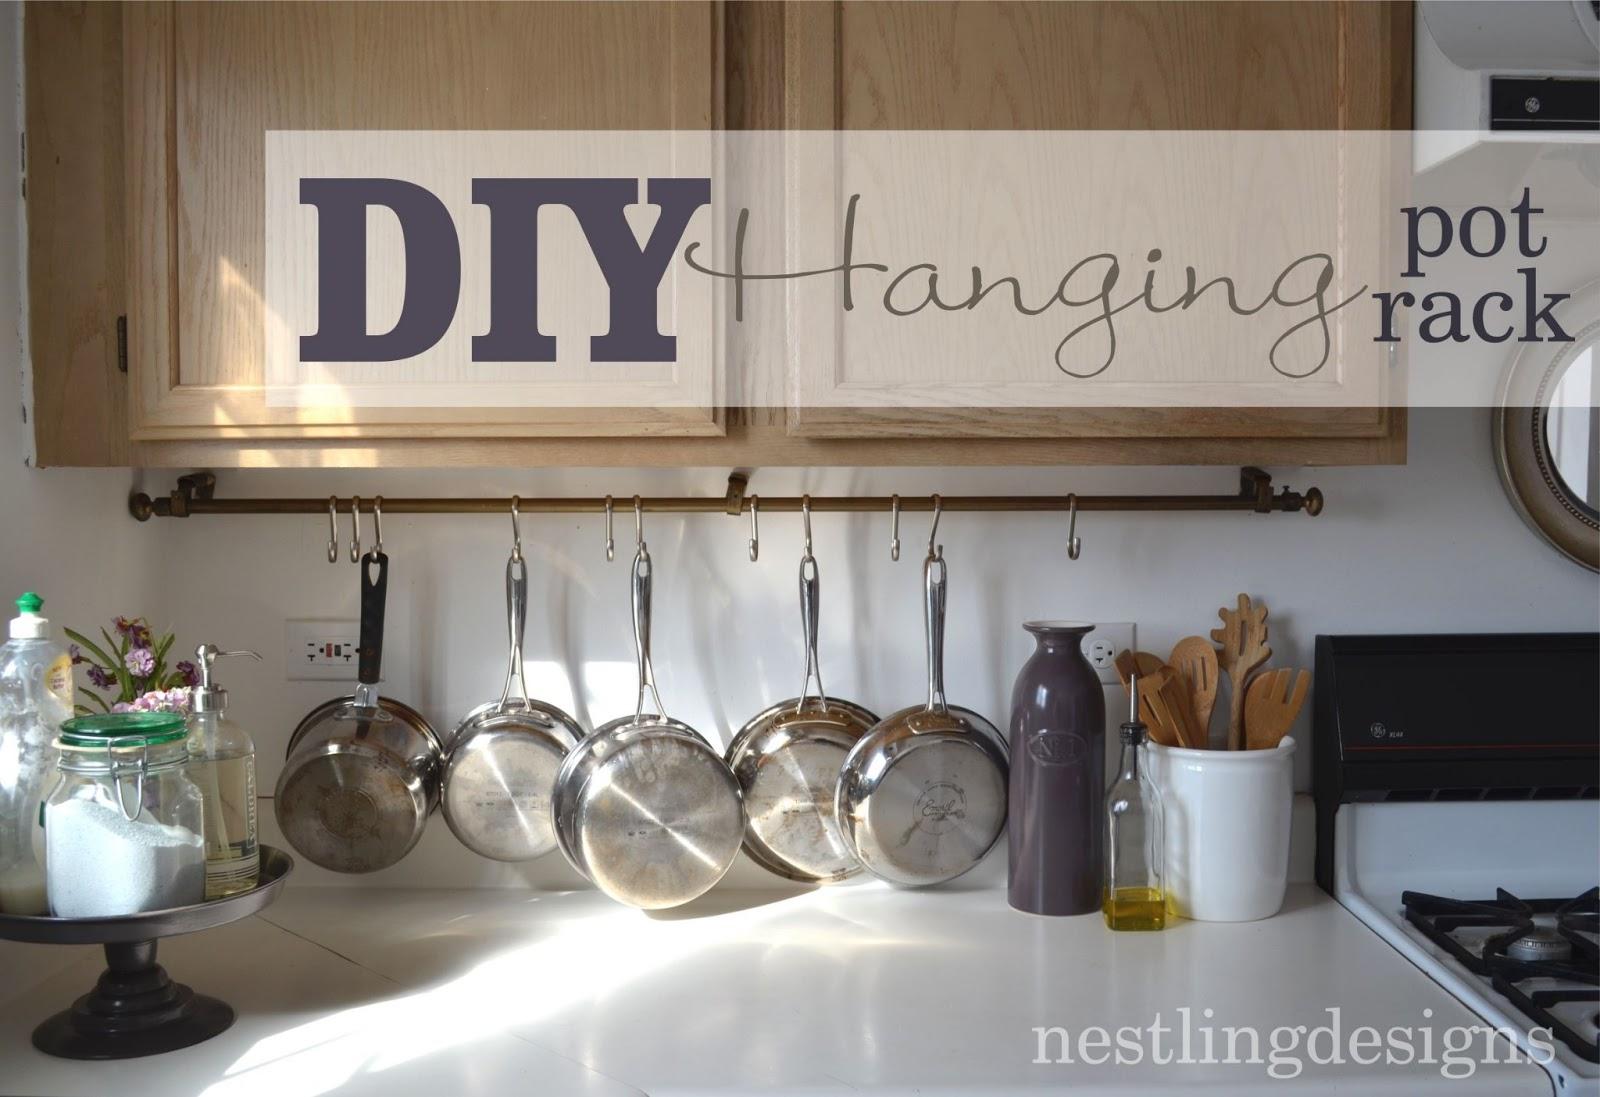 One Room At A Time :: DIY Hanging Pot Rack